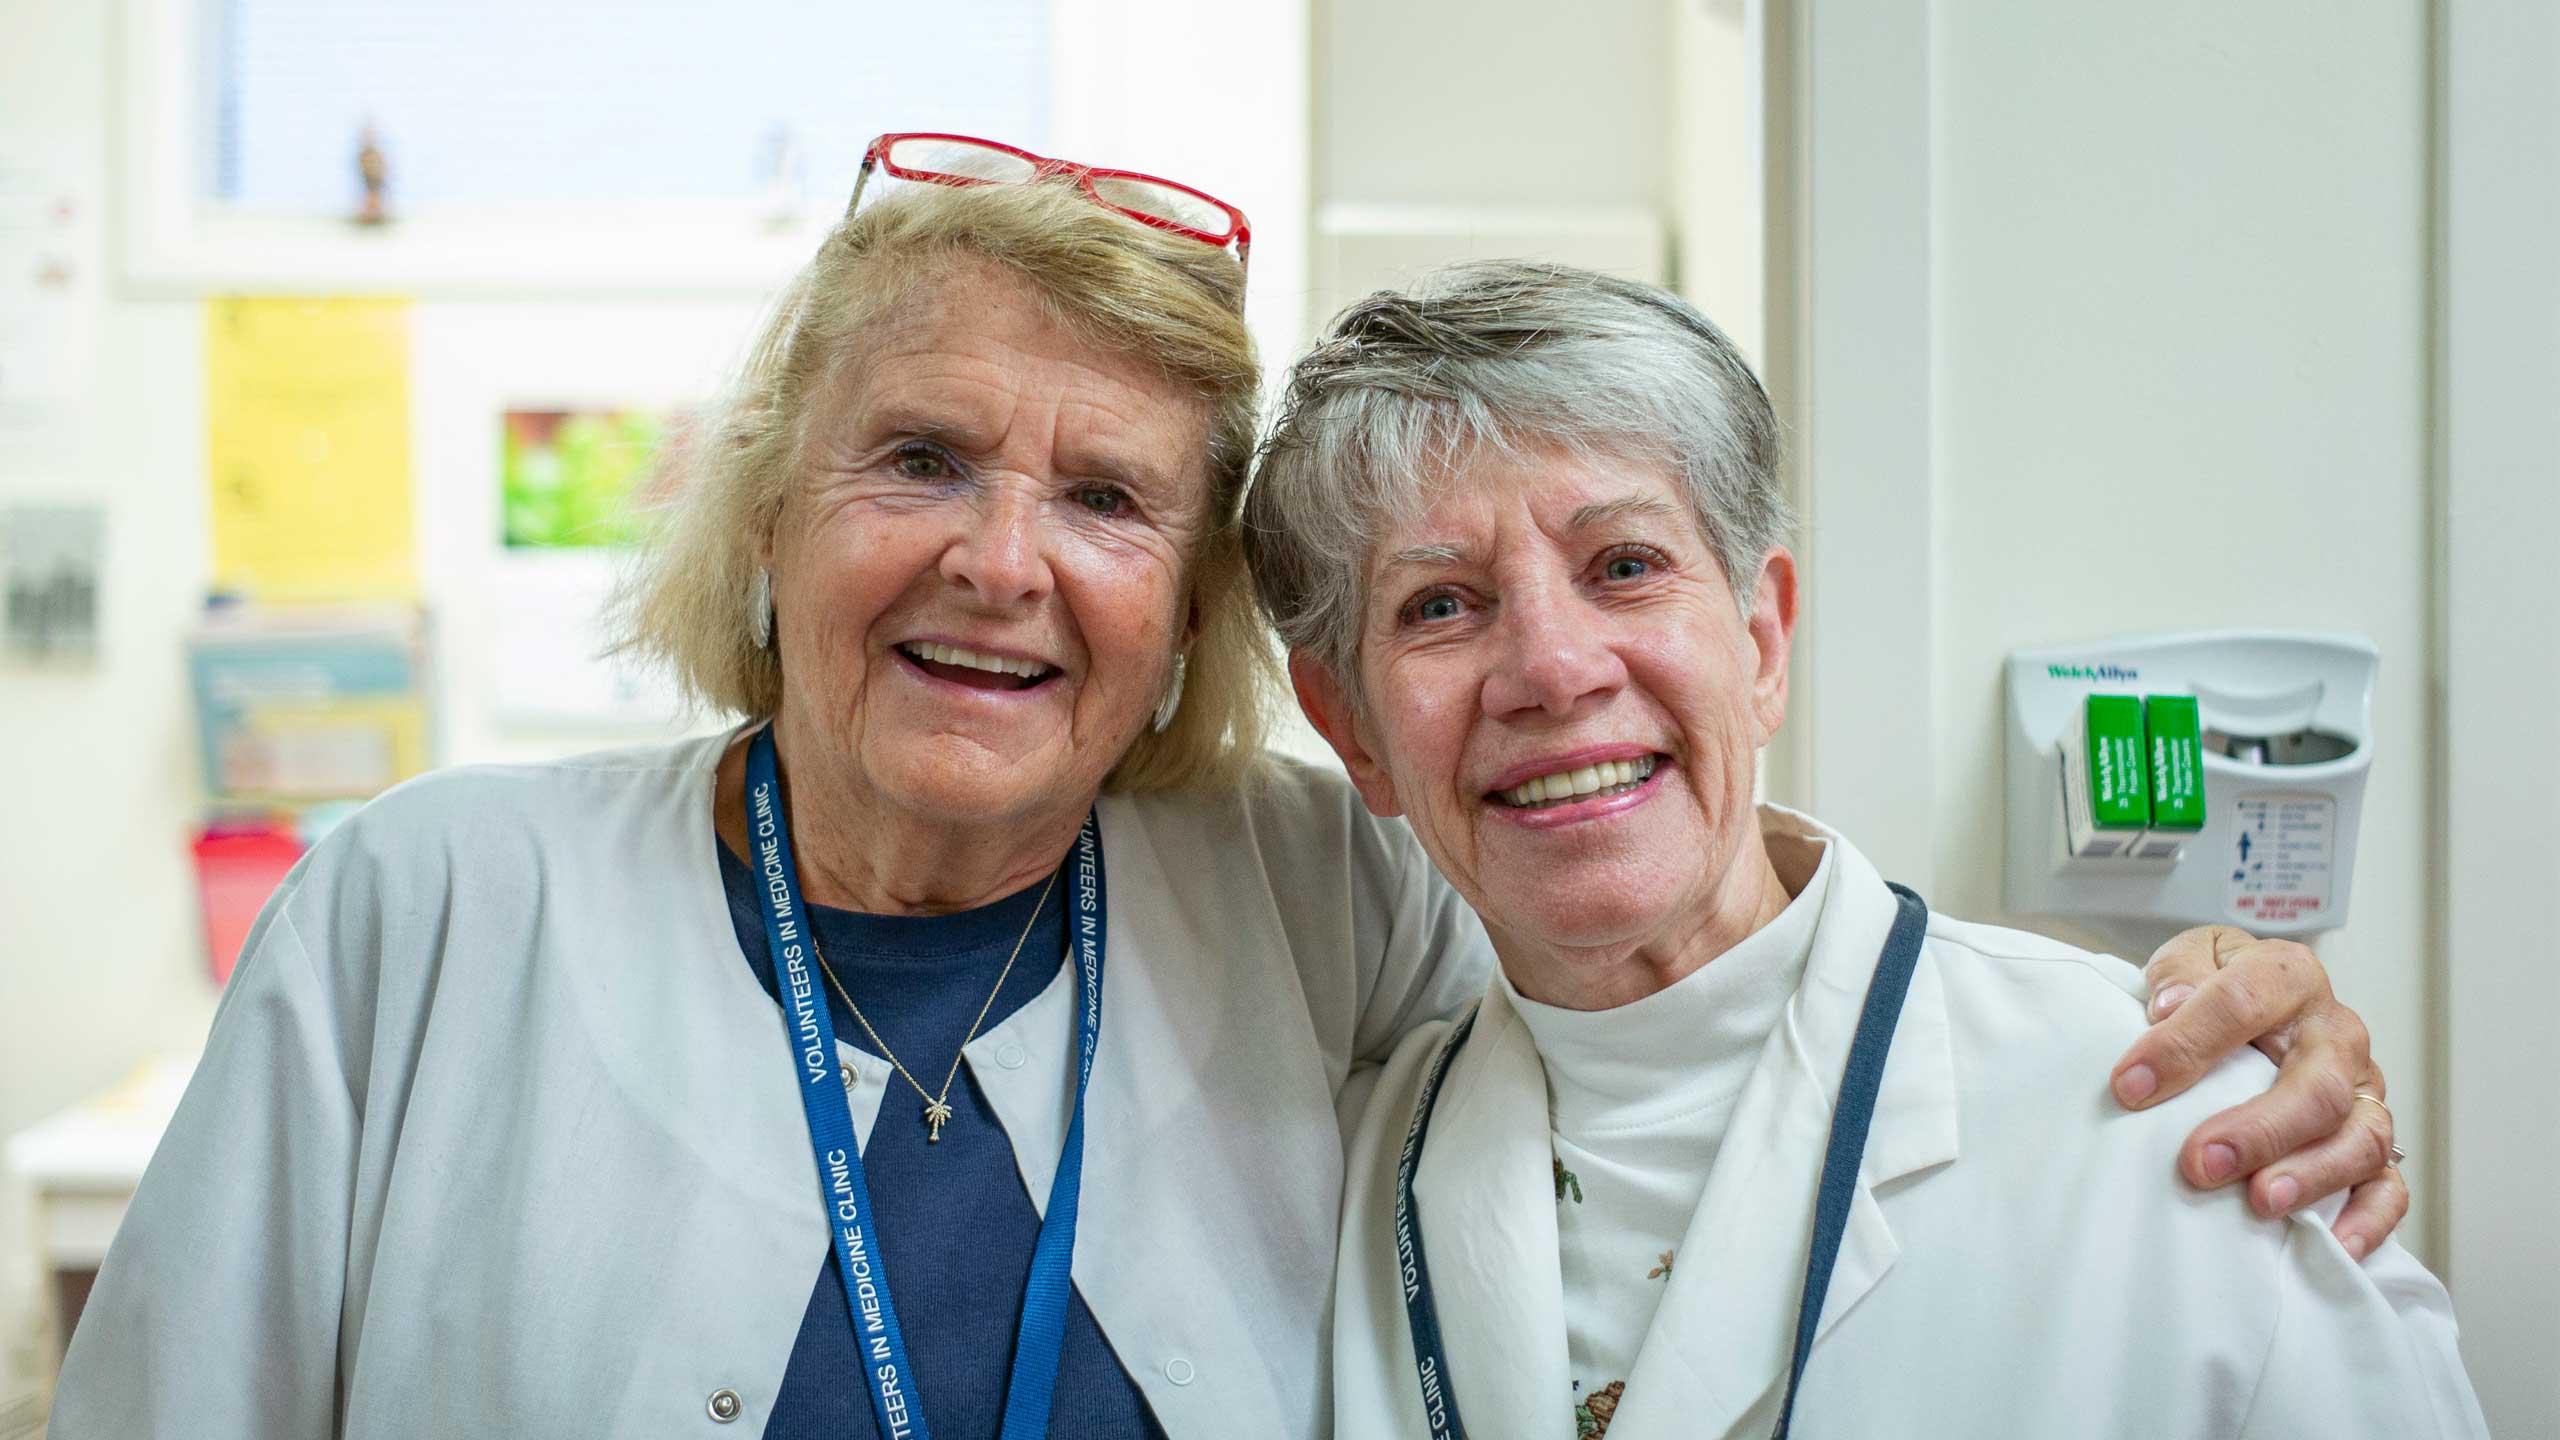 Volunteers from Volunteers in Medicine America posing for a picture